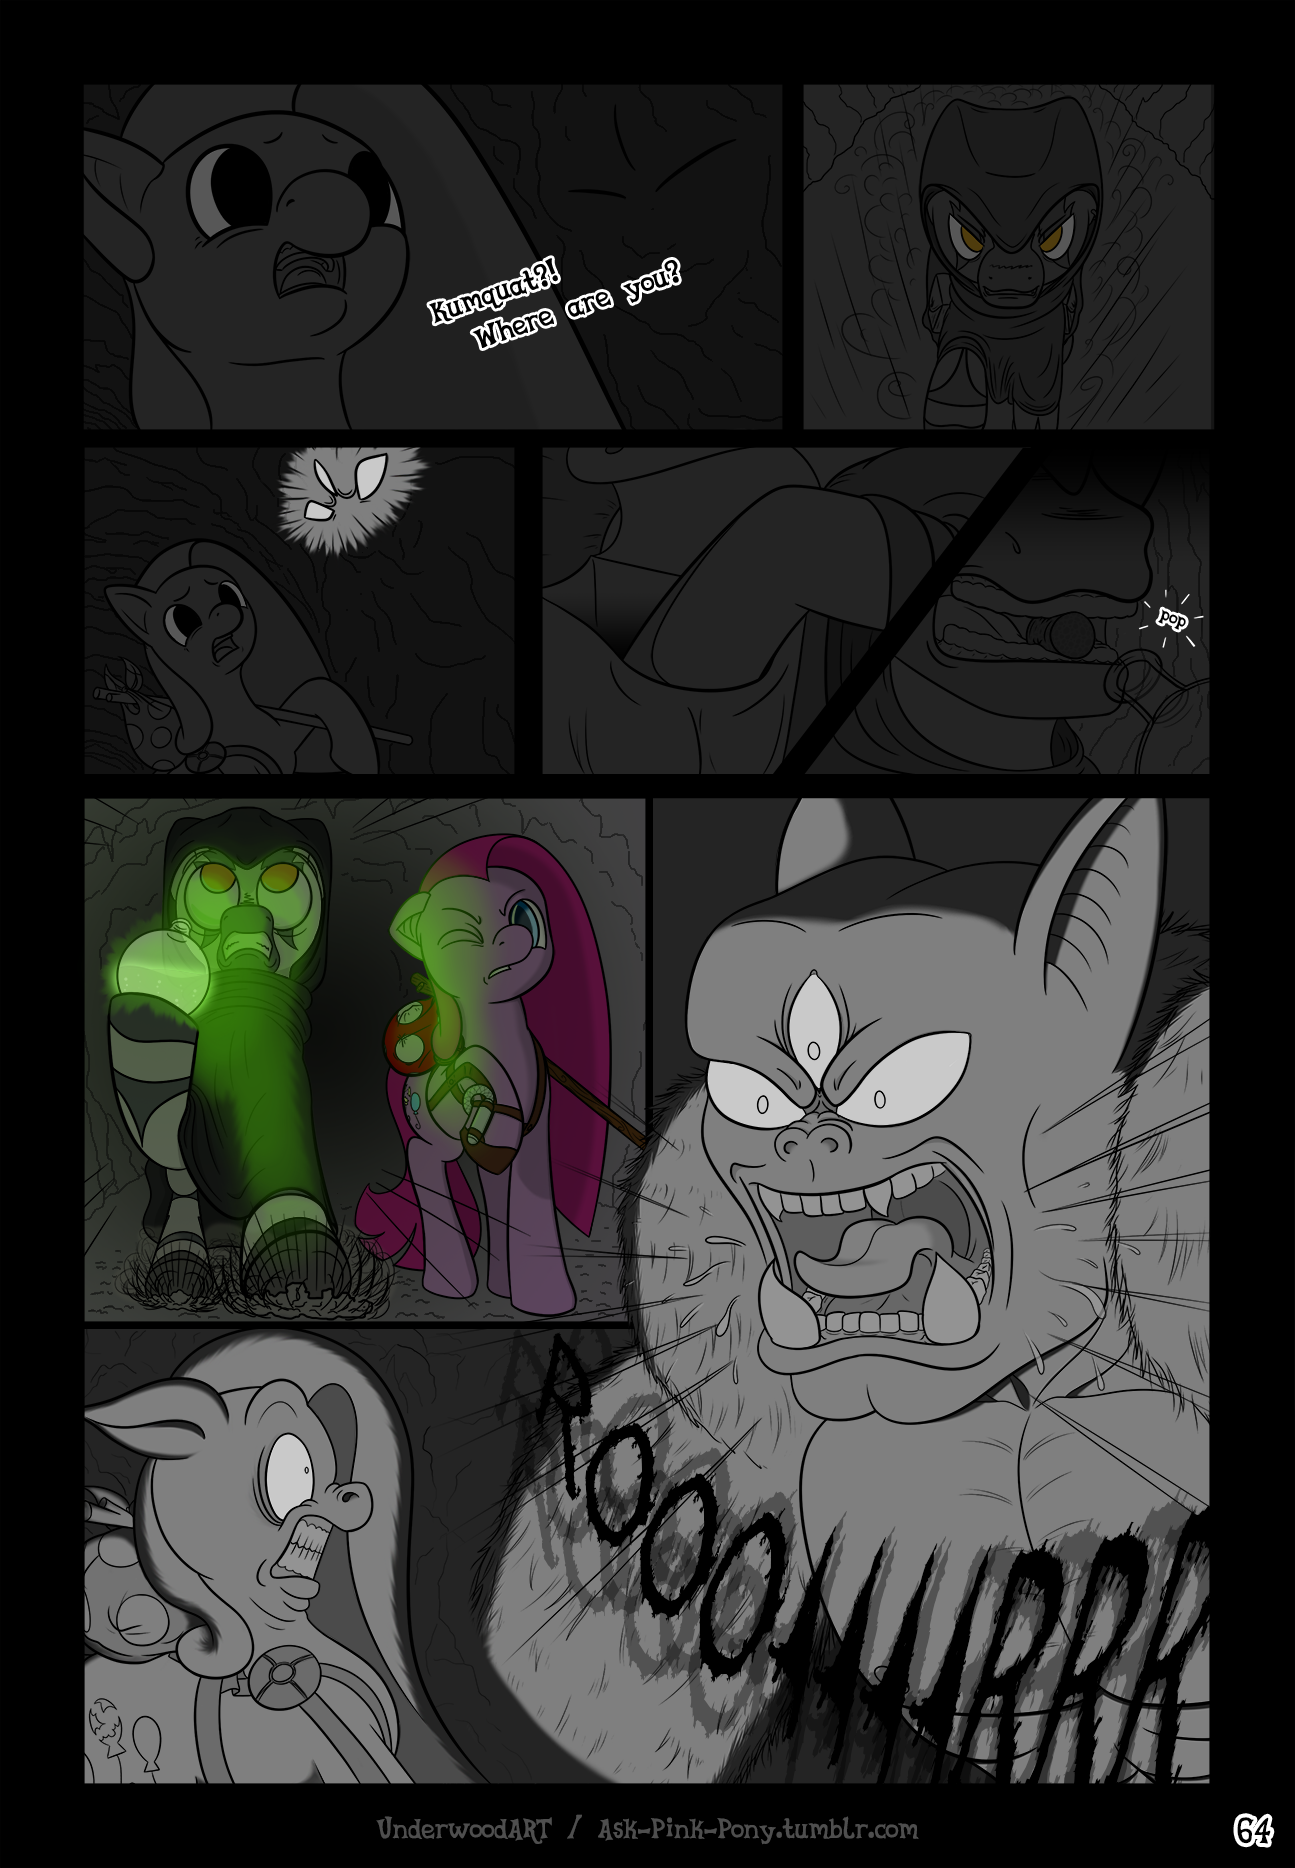 Ask-Pink-Pony #64 by UnderwoodART